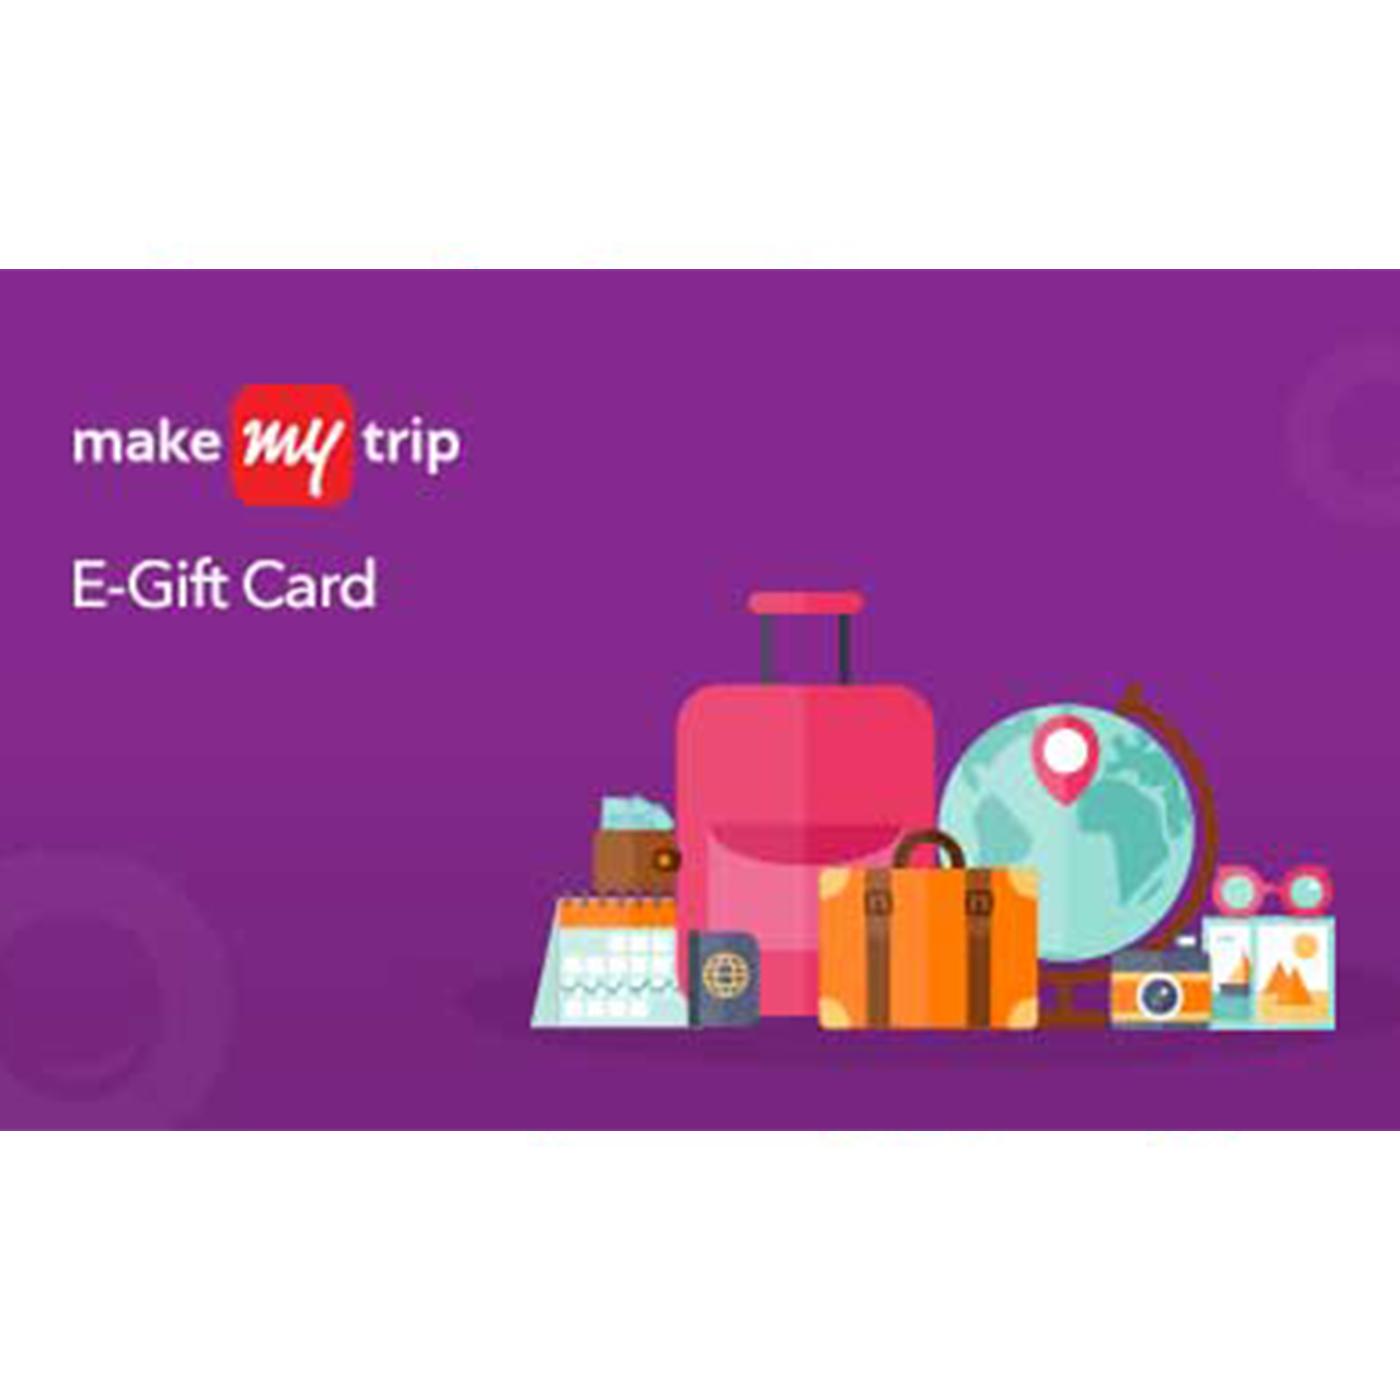 MakeMyTrip Holiday E-Gift Card